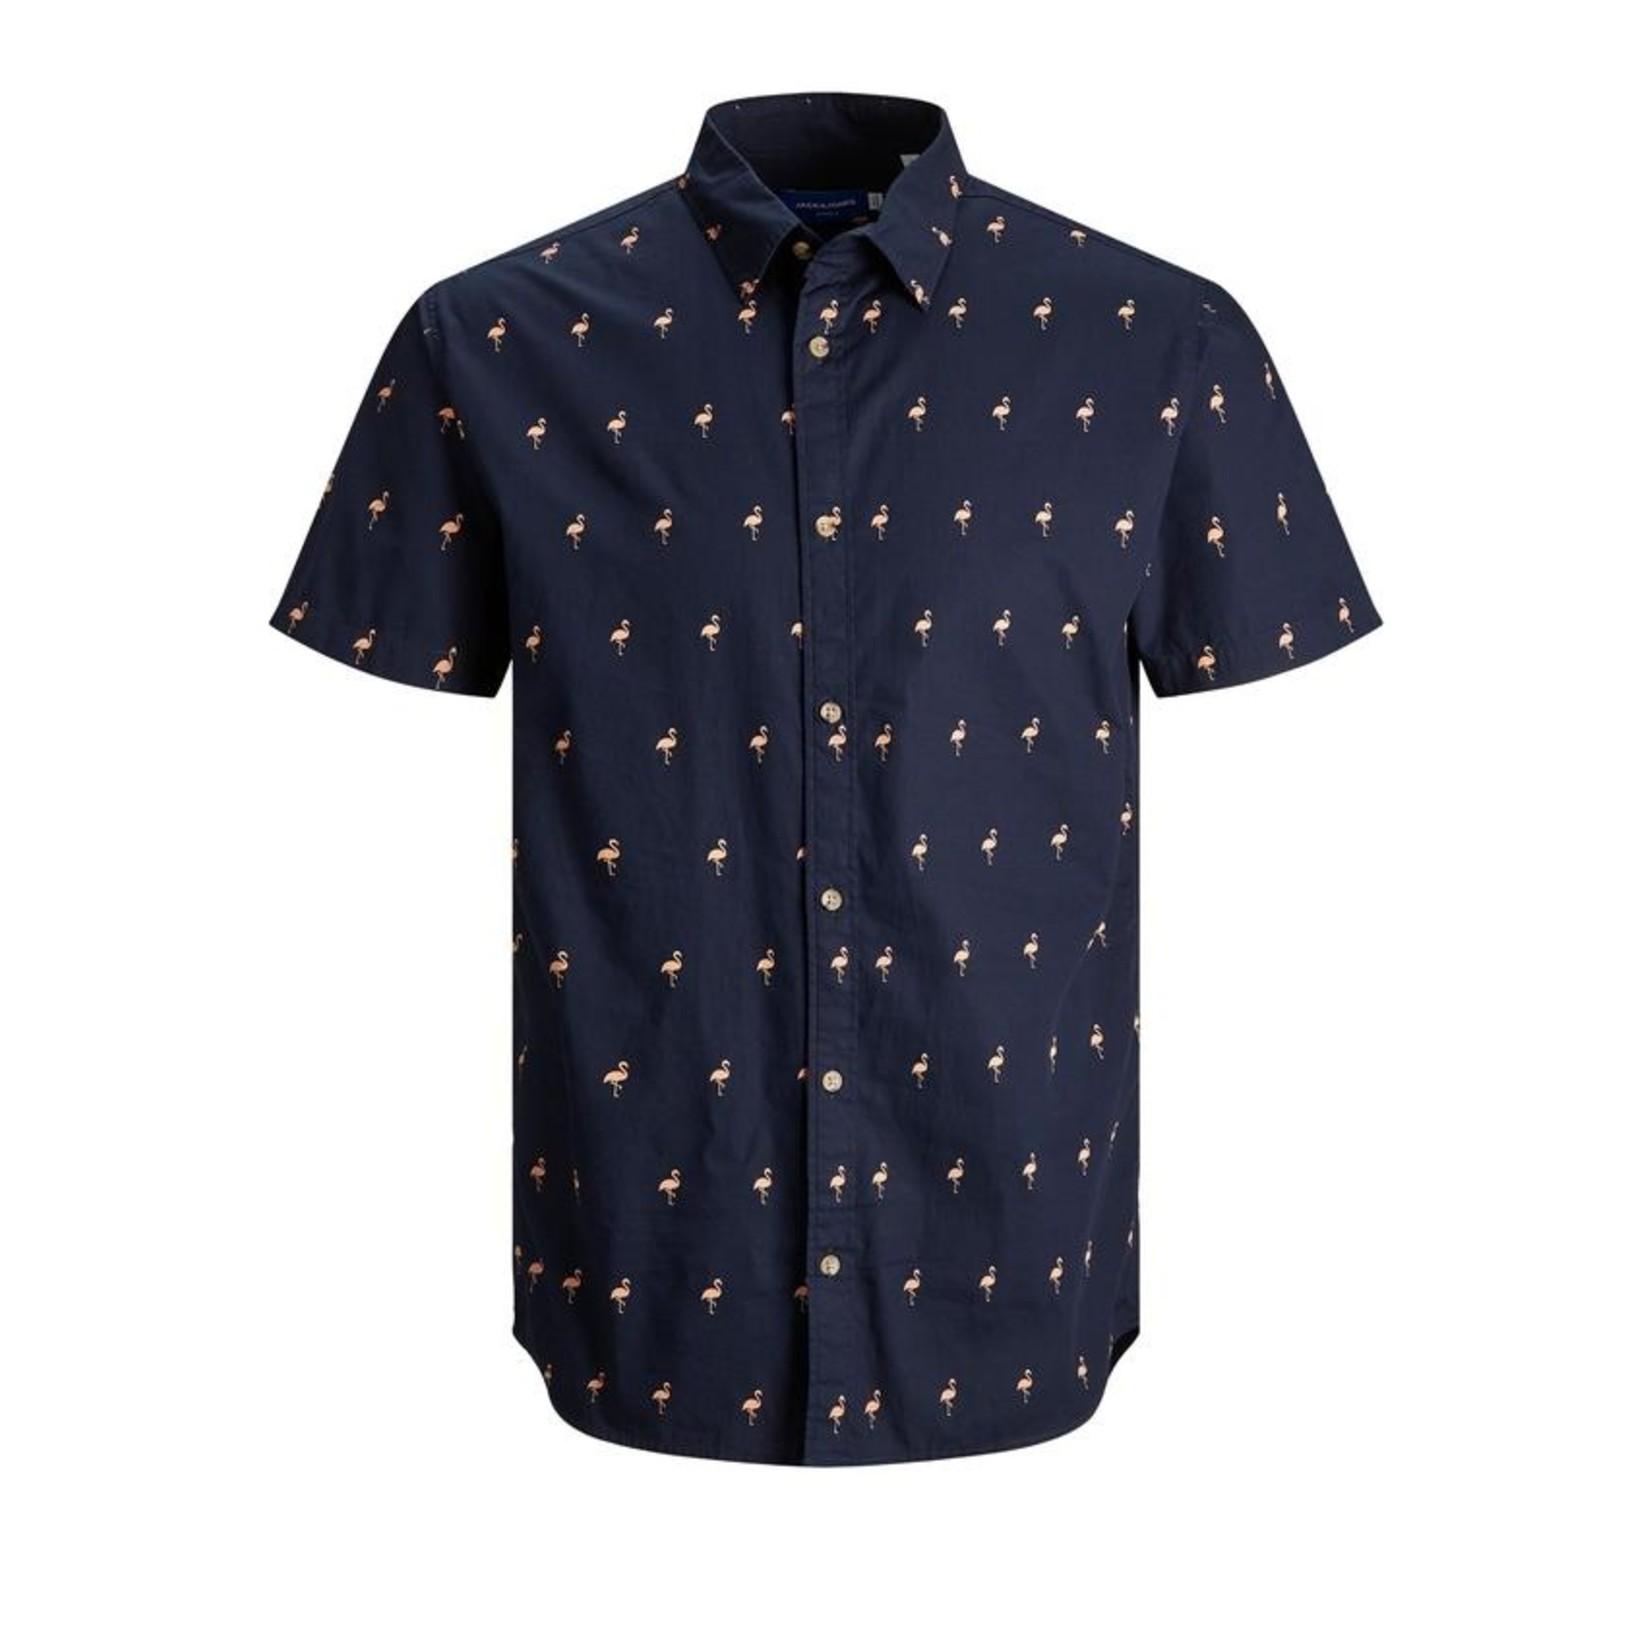 Jack & Jones Jack & Jones 12187951 Poolside Short-Sleeve Shirt - Navy Blazer